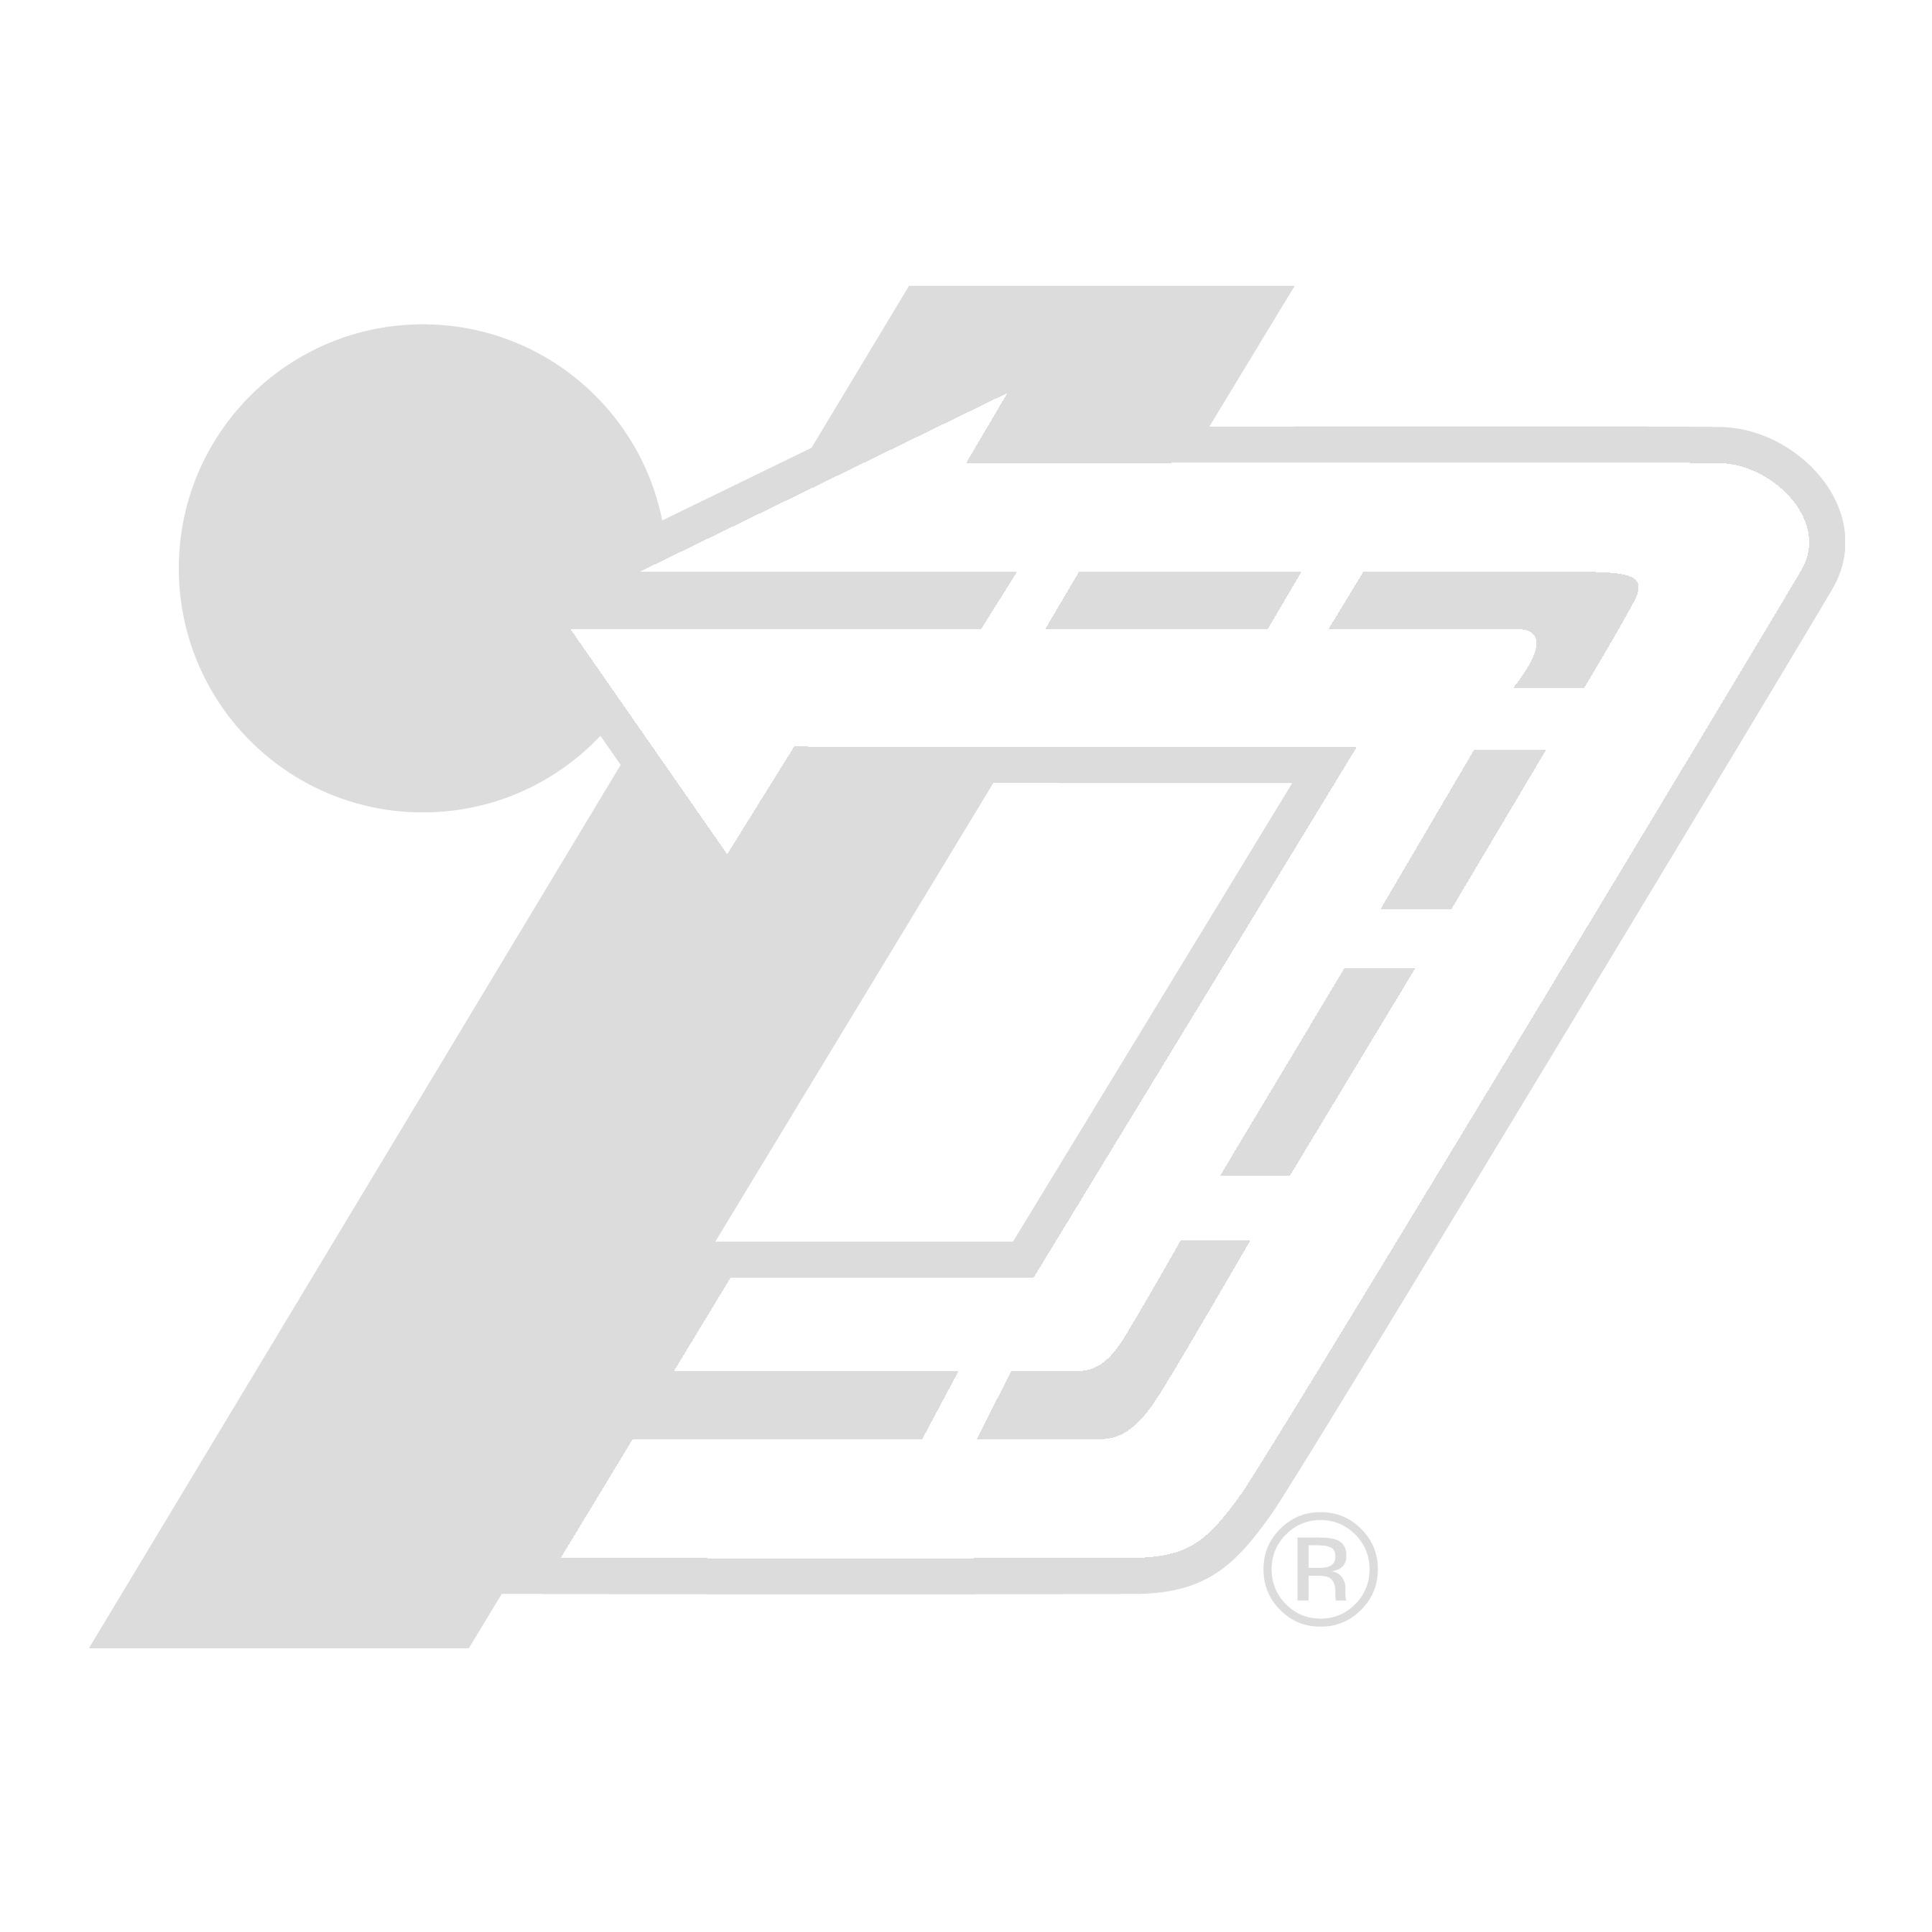 Black TrafFix Alert Rumble Strip - Alerting Drivers with Sight, Sound and Sensation Awareness